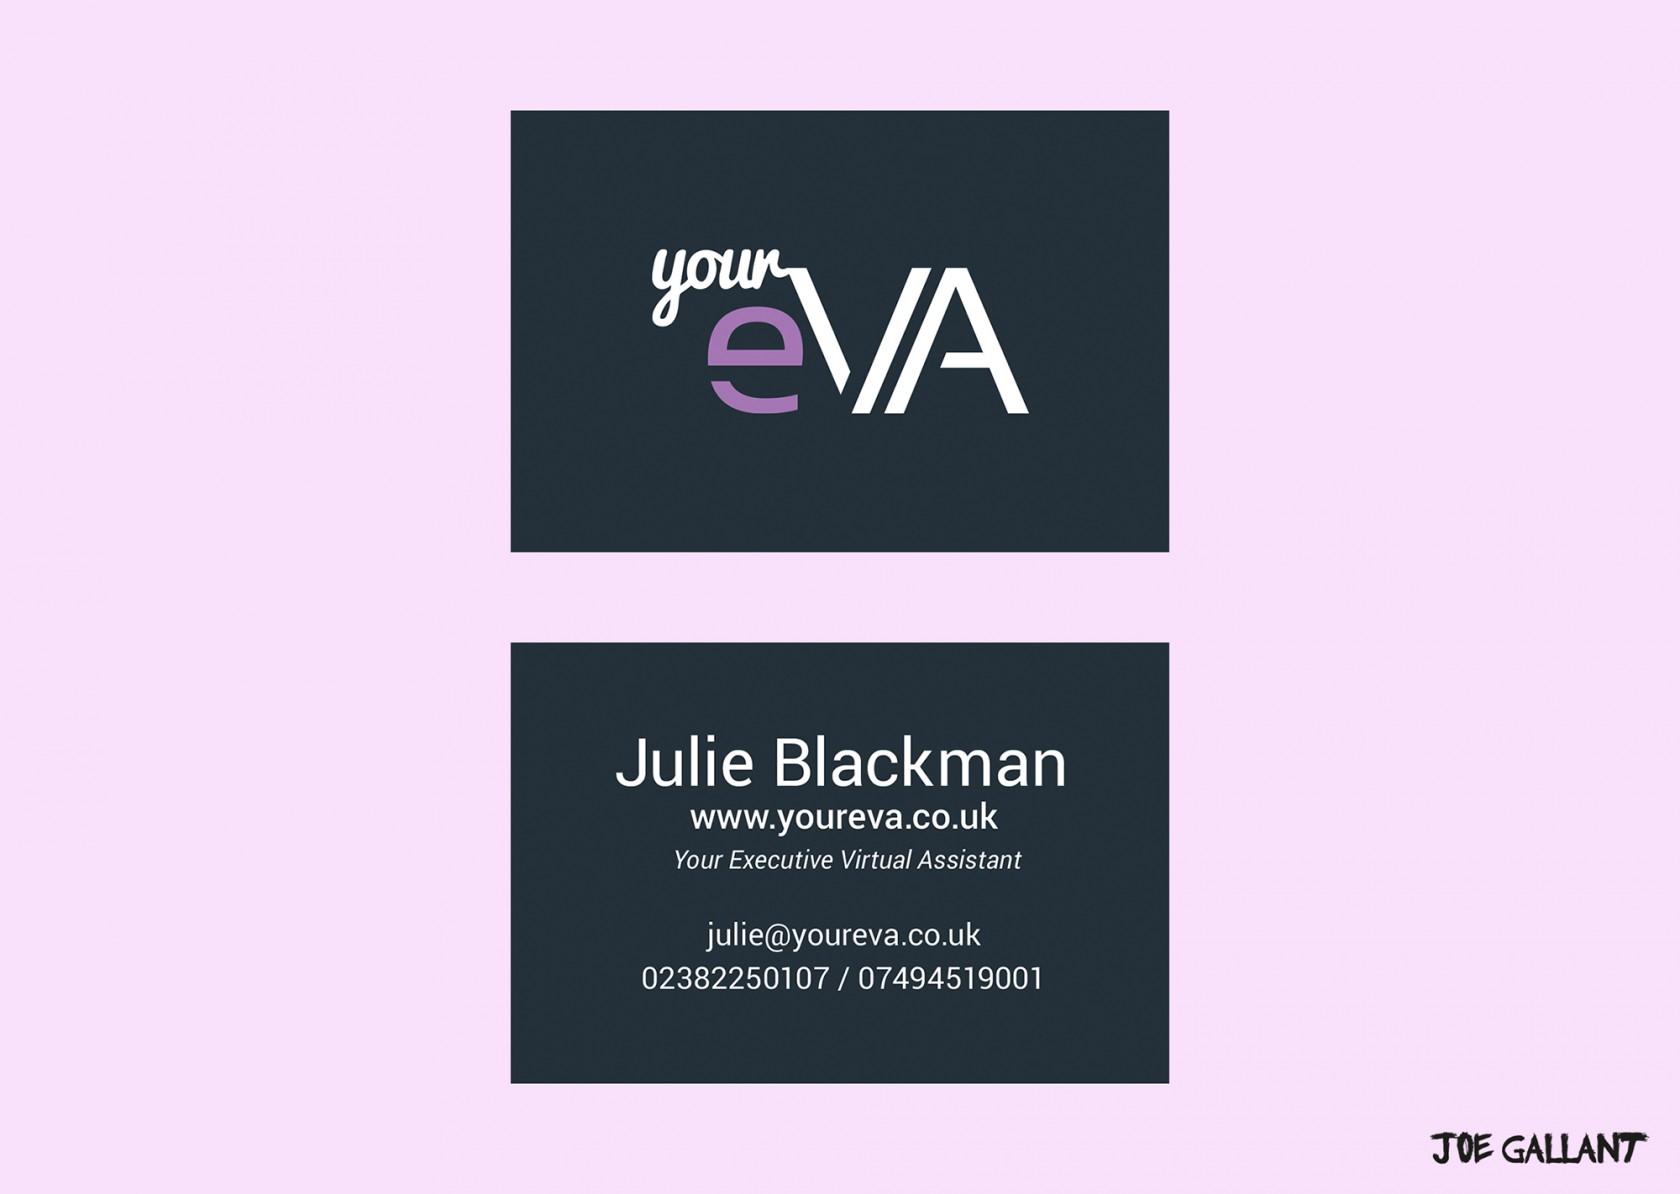 Mockup of YourEVA custom business card design